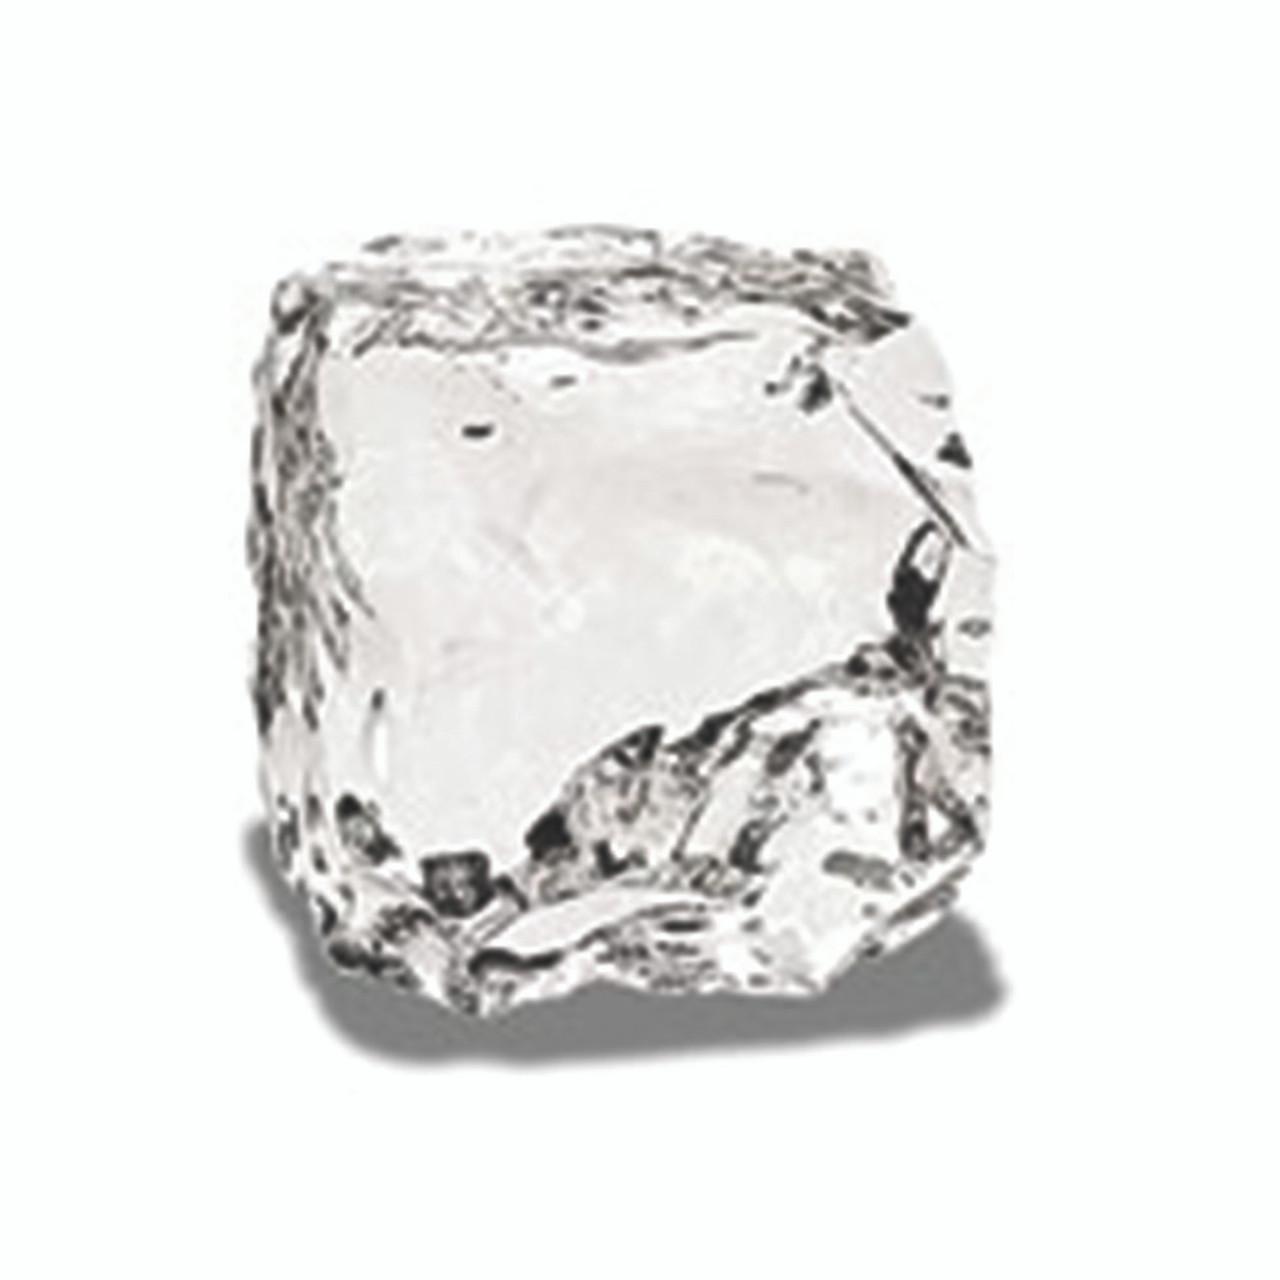 "TRENGOVE 2"" Acrylic Ice Cubes / Ice Shard (1 Piece)"